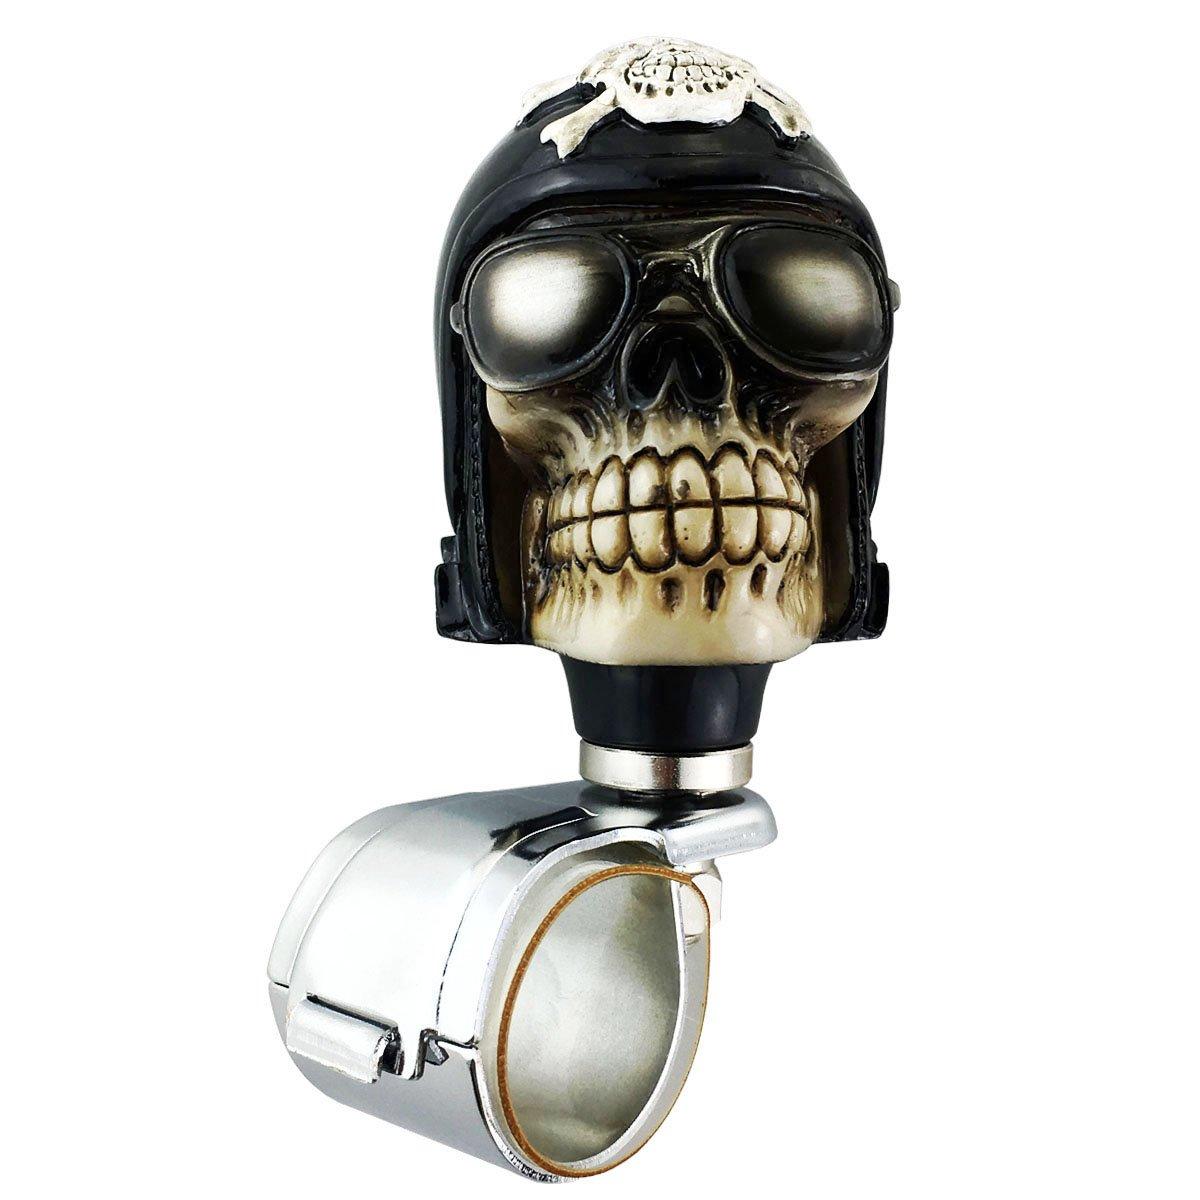 Abfer Suicide Knob Wheel Spinner Skull Steering Wheel Assist Knob Gold Steering Spinning Handle Ball for Vehicles